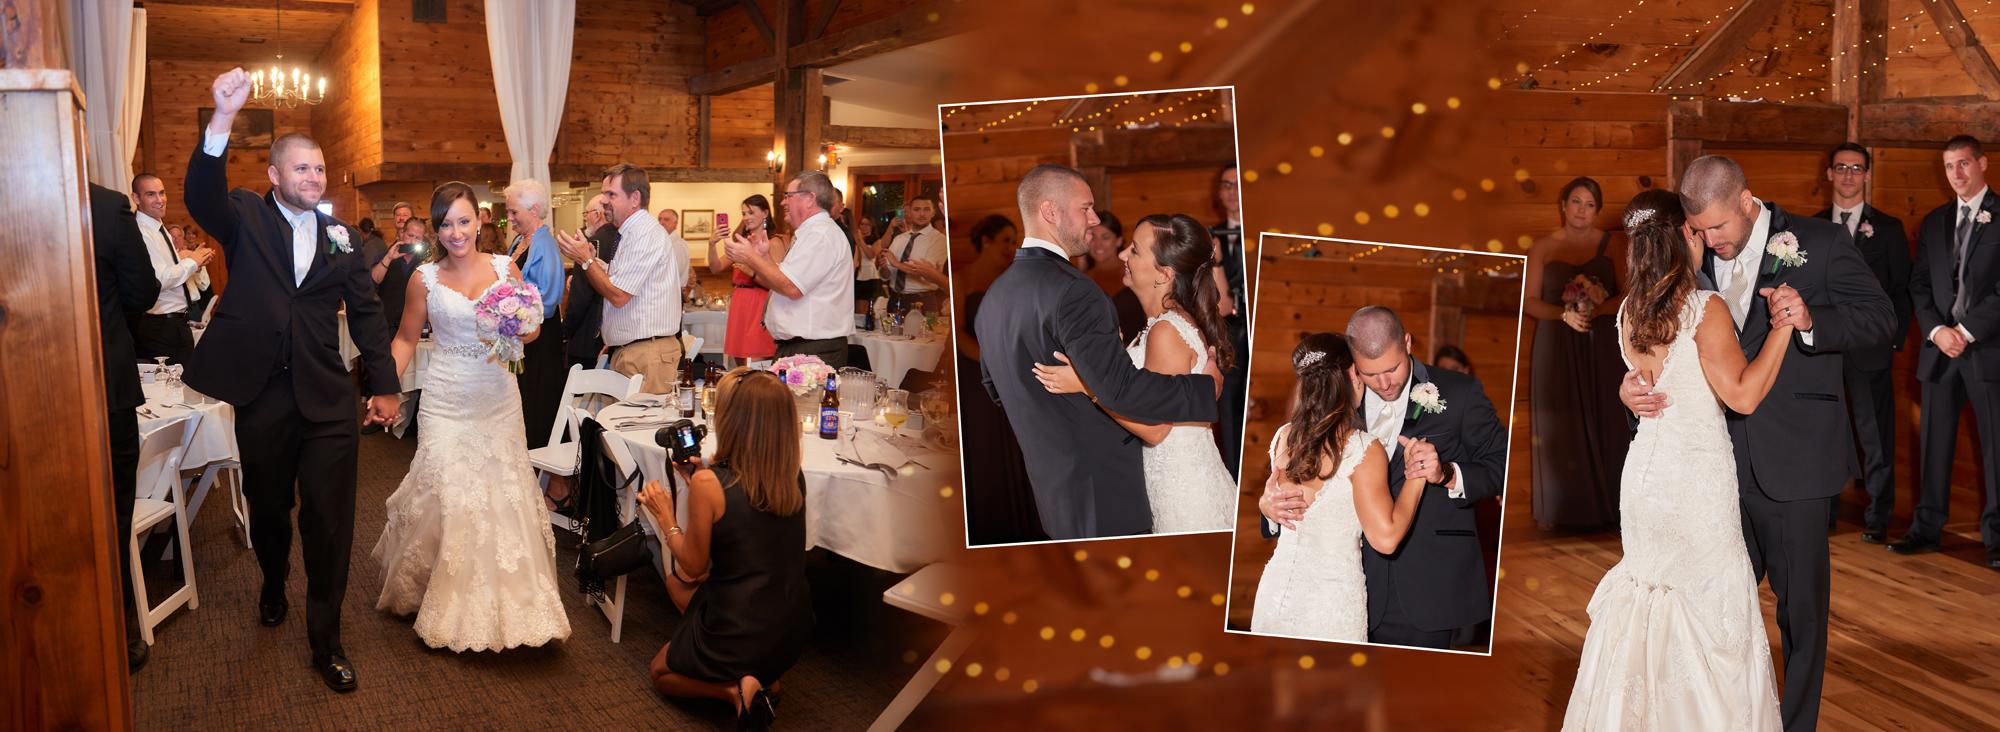 Dave_Soucy_APM_wedding_photography.032.jpg